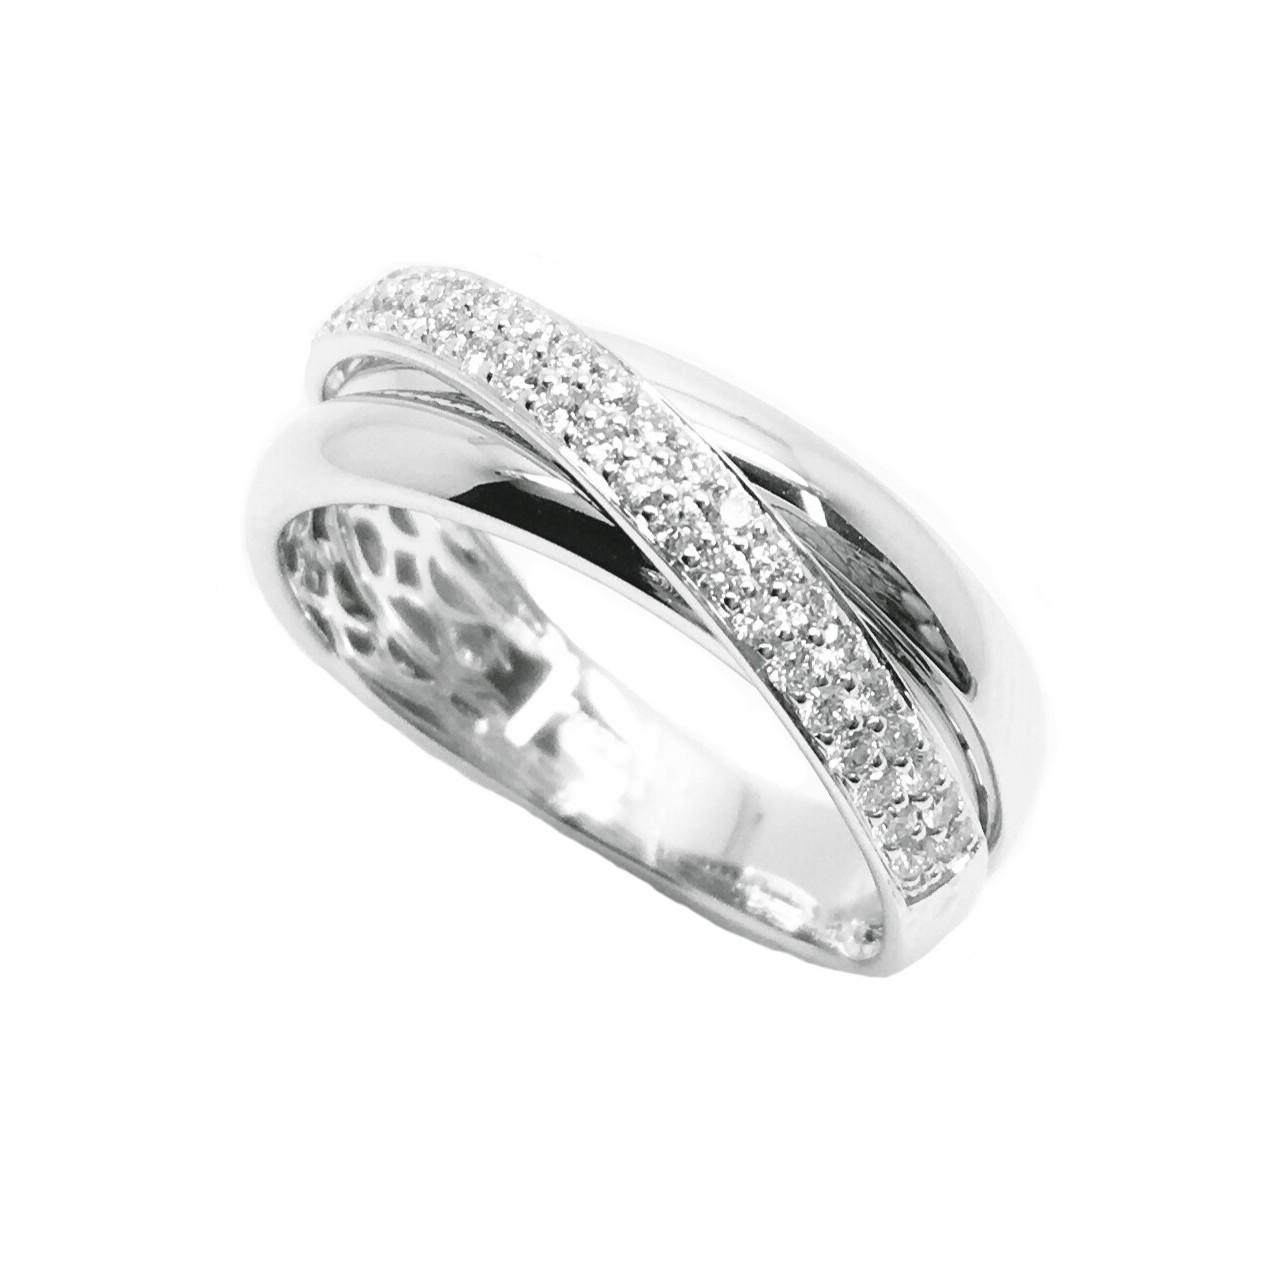 f5a643998247 Sortija de oro blanco diamante cruzado Joyería Juan Luis Larráyoz Pamplona  sortijas de compromiso pamplona sortija